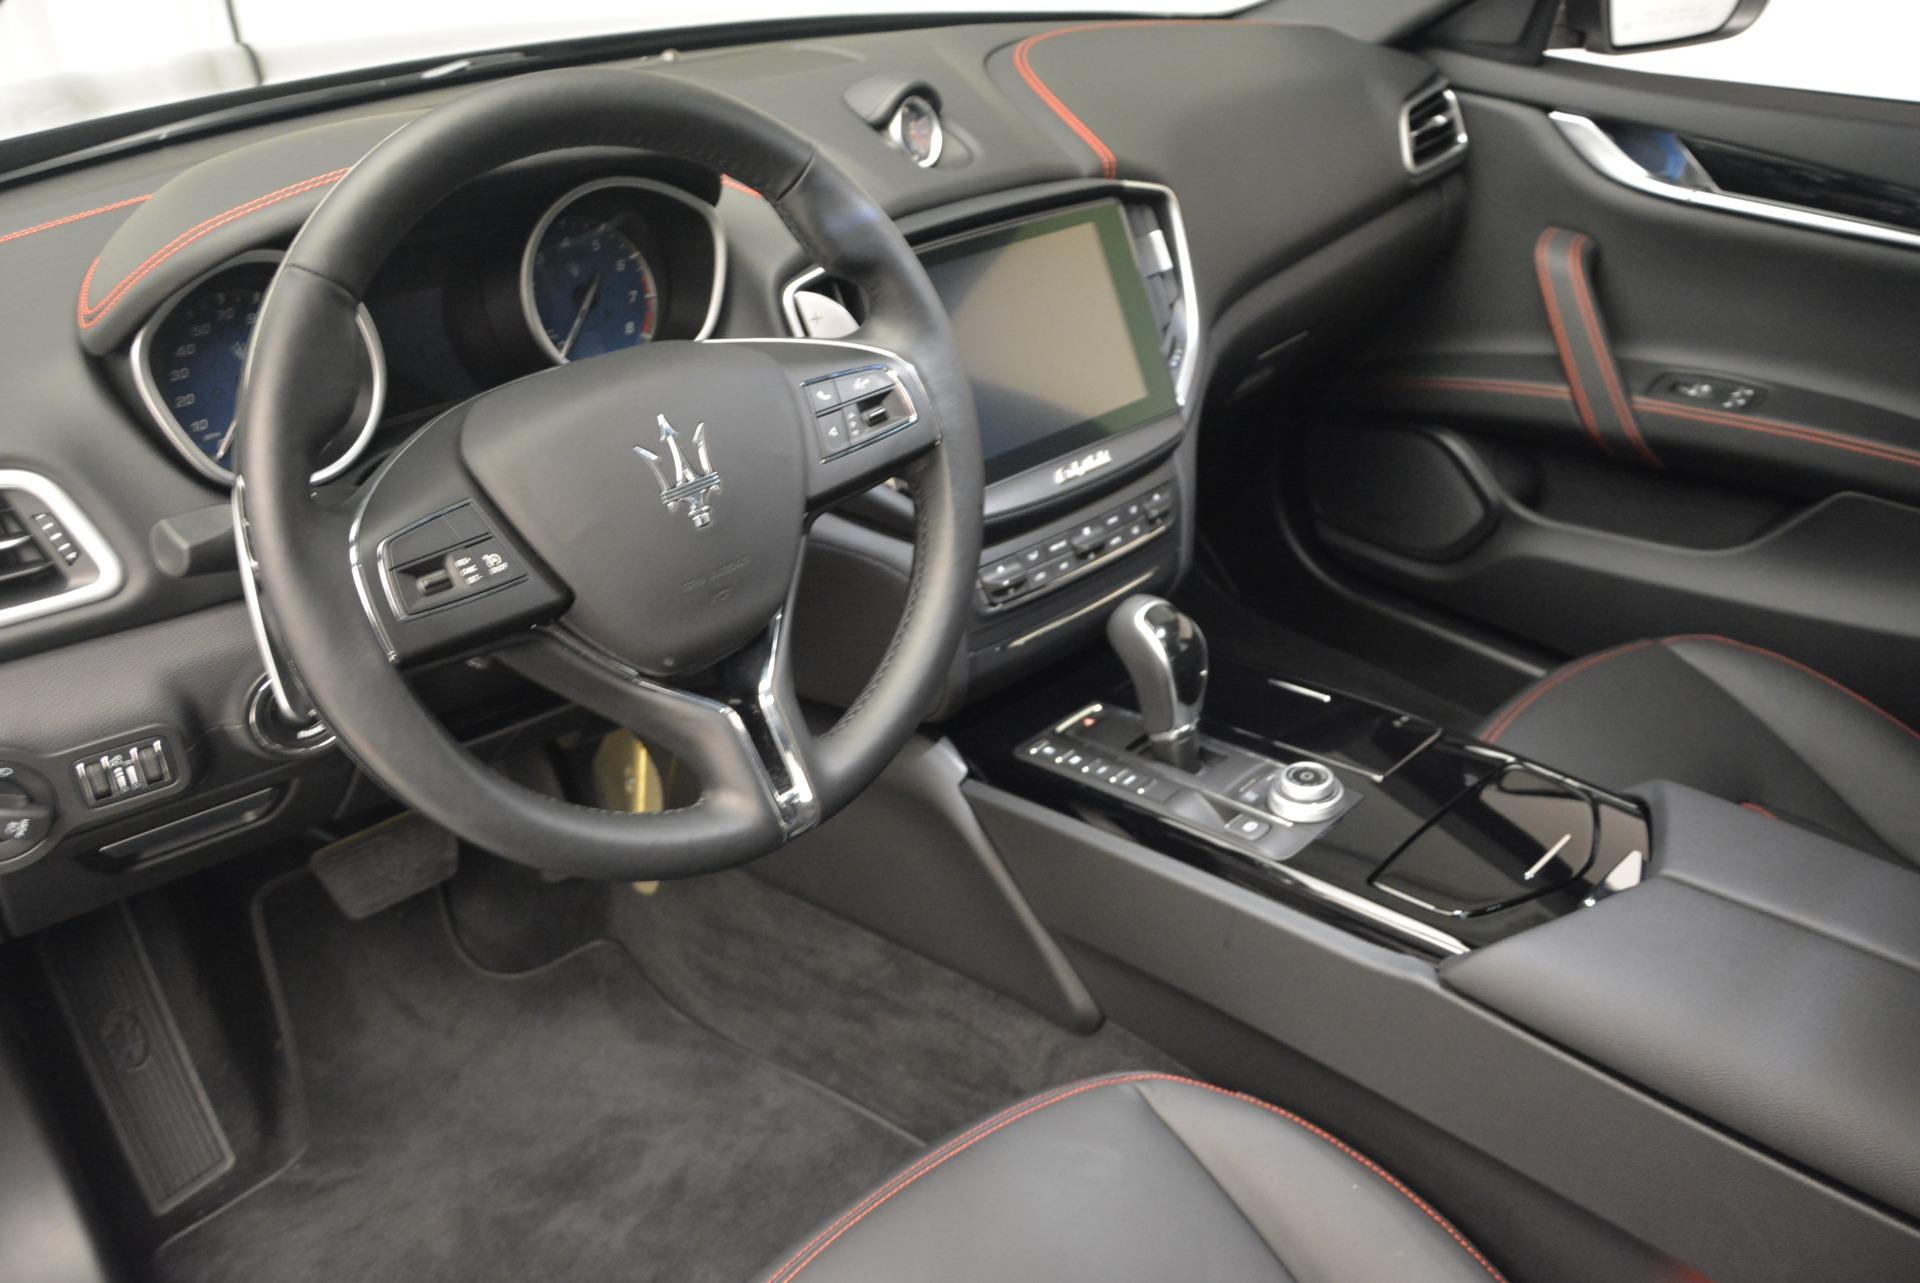 Used 2017 Maserati Ghibli S Q4 - EX Loaner For Sale In Greenwich, CT 576_p13